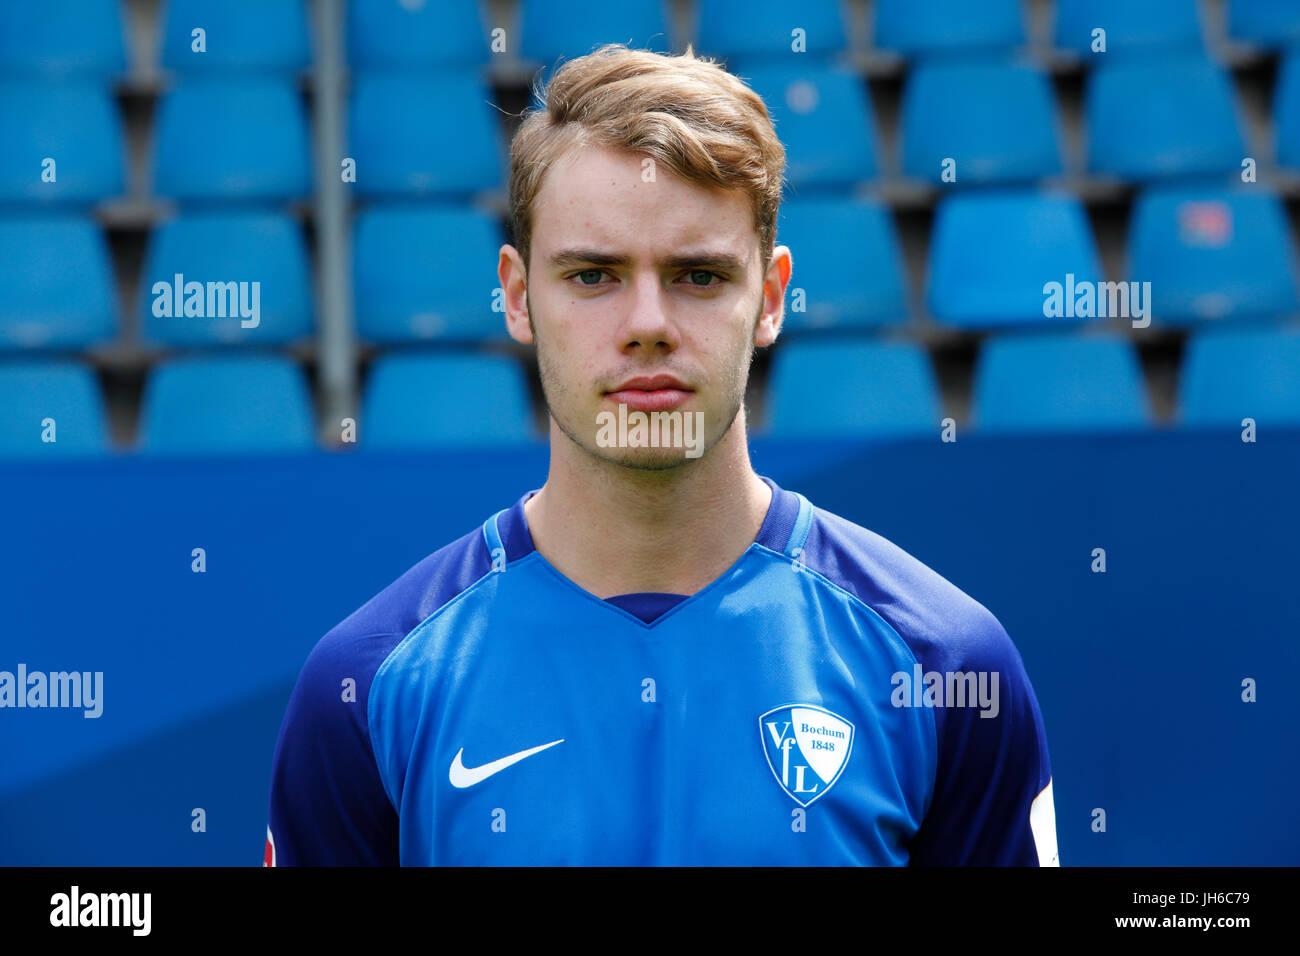 football, 2. Bundesliga, 2017/2018, VfL Bochum, team presentation for the game season, Julian Tomas - Stock Image